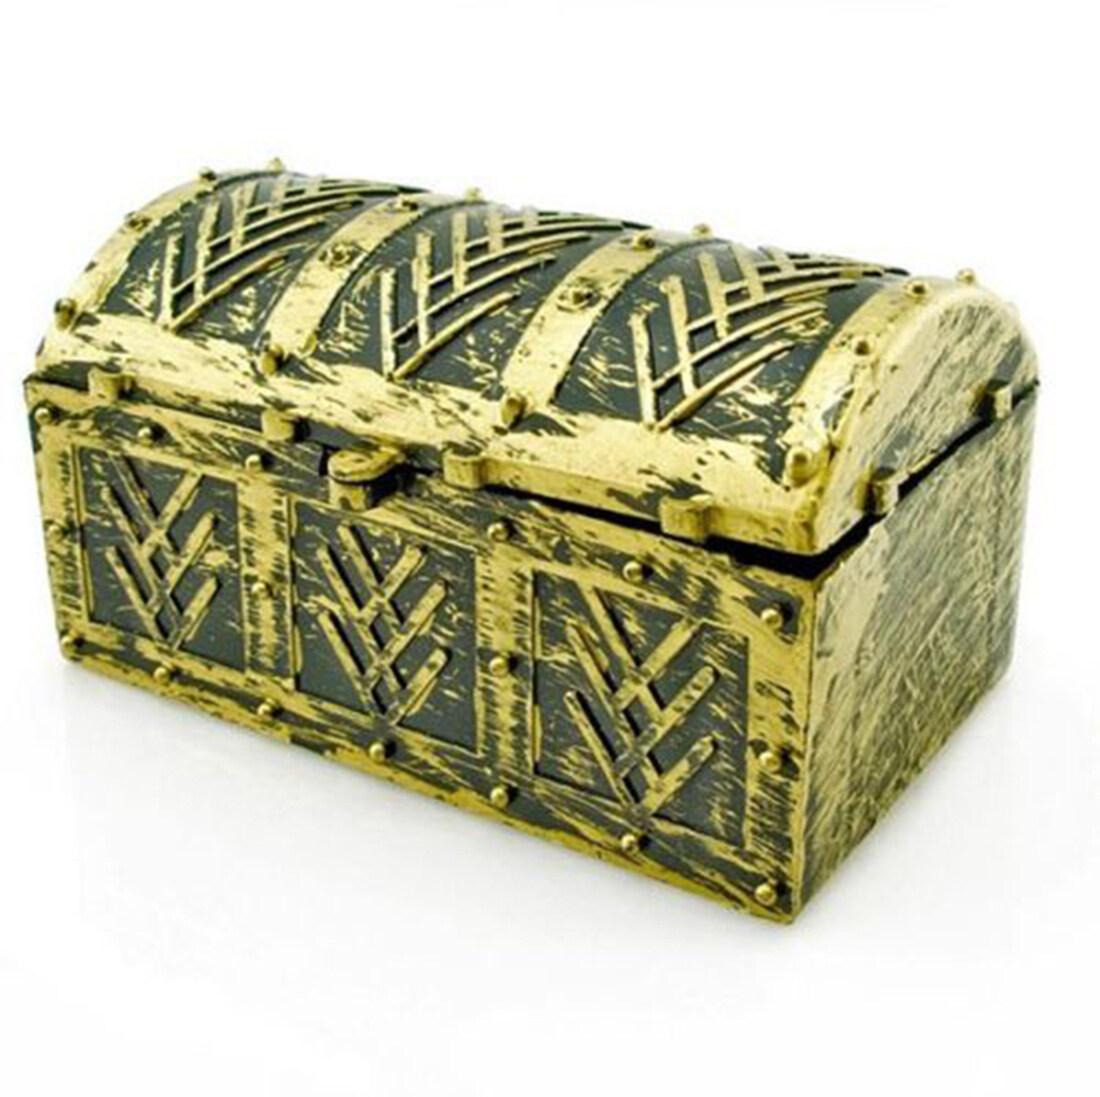 jetting buy halloween pirate treasure chest toy 4pcs lazada malaysia